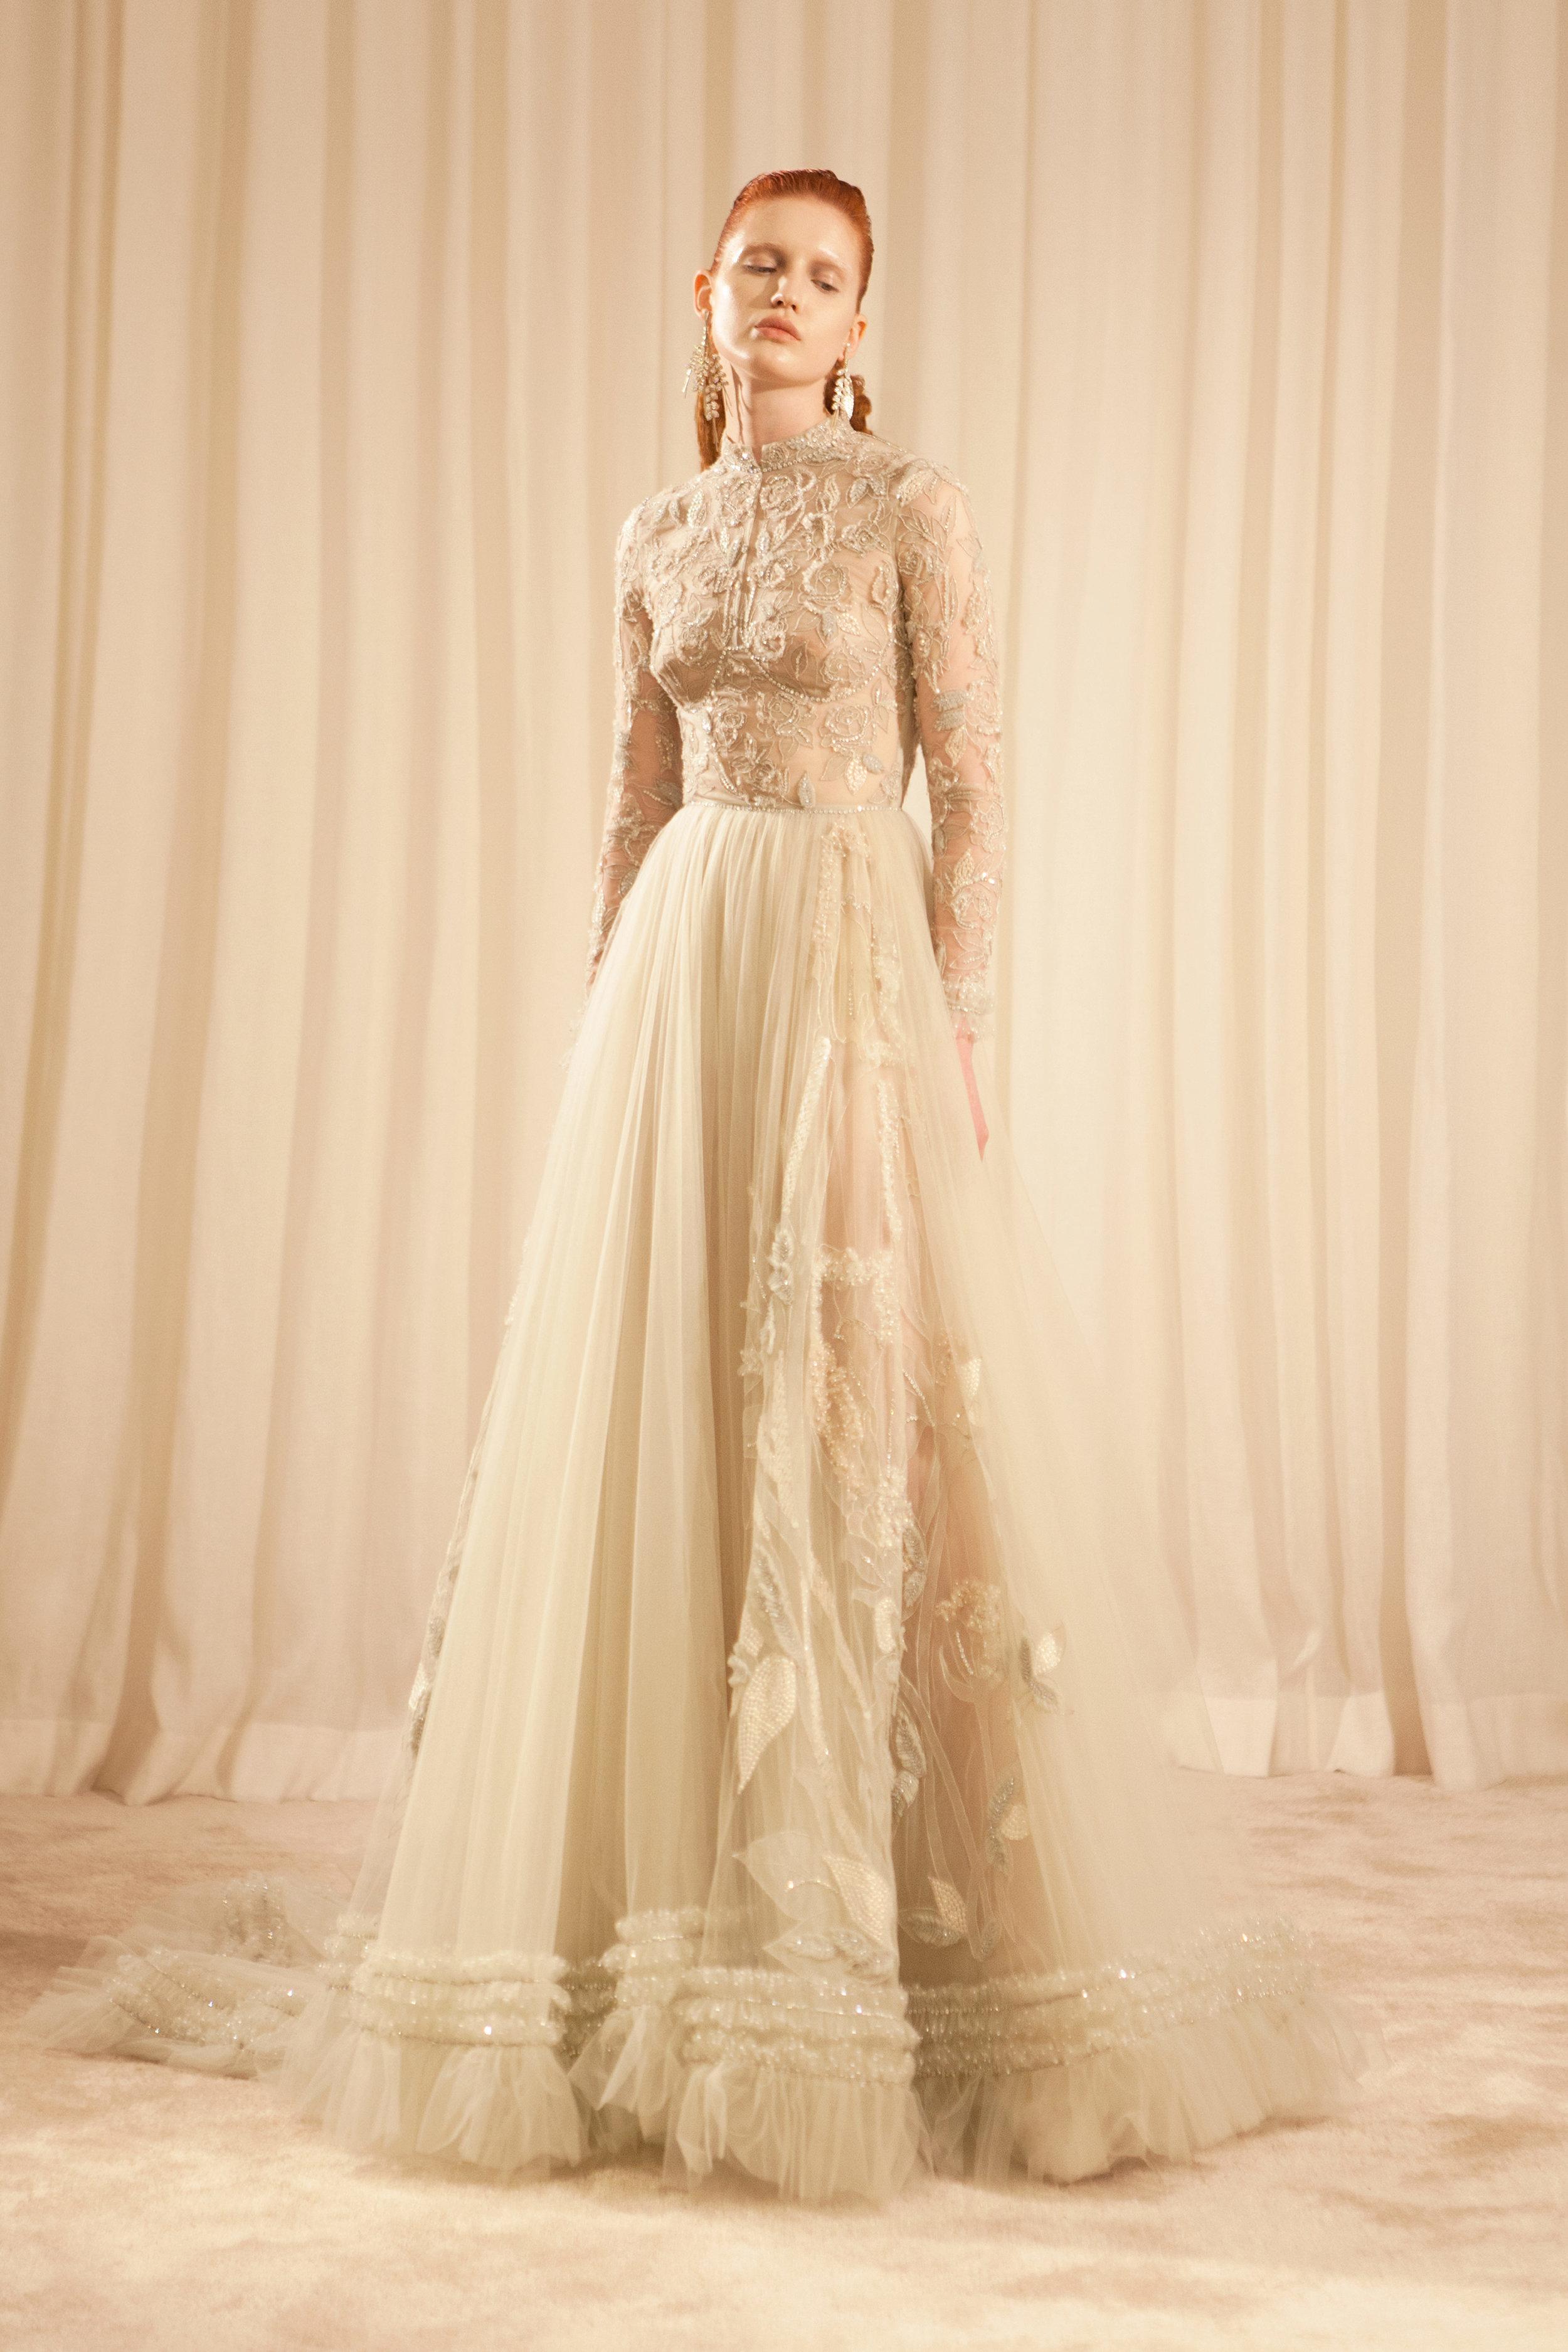 SandraMansour-S1-Lookbook-Bridal-06.jpg